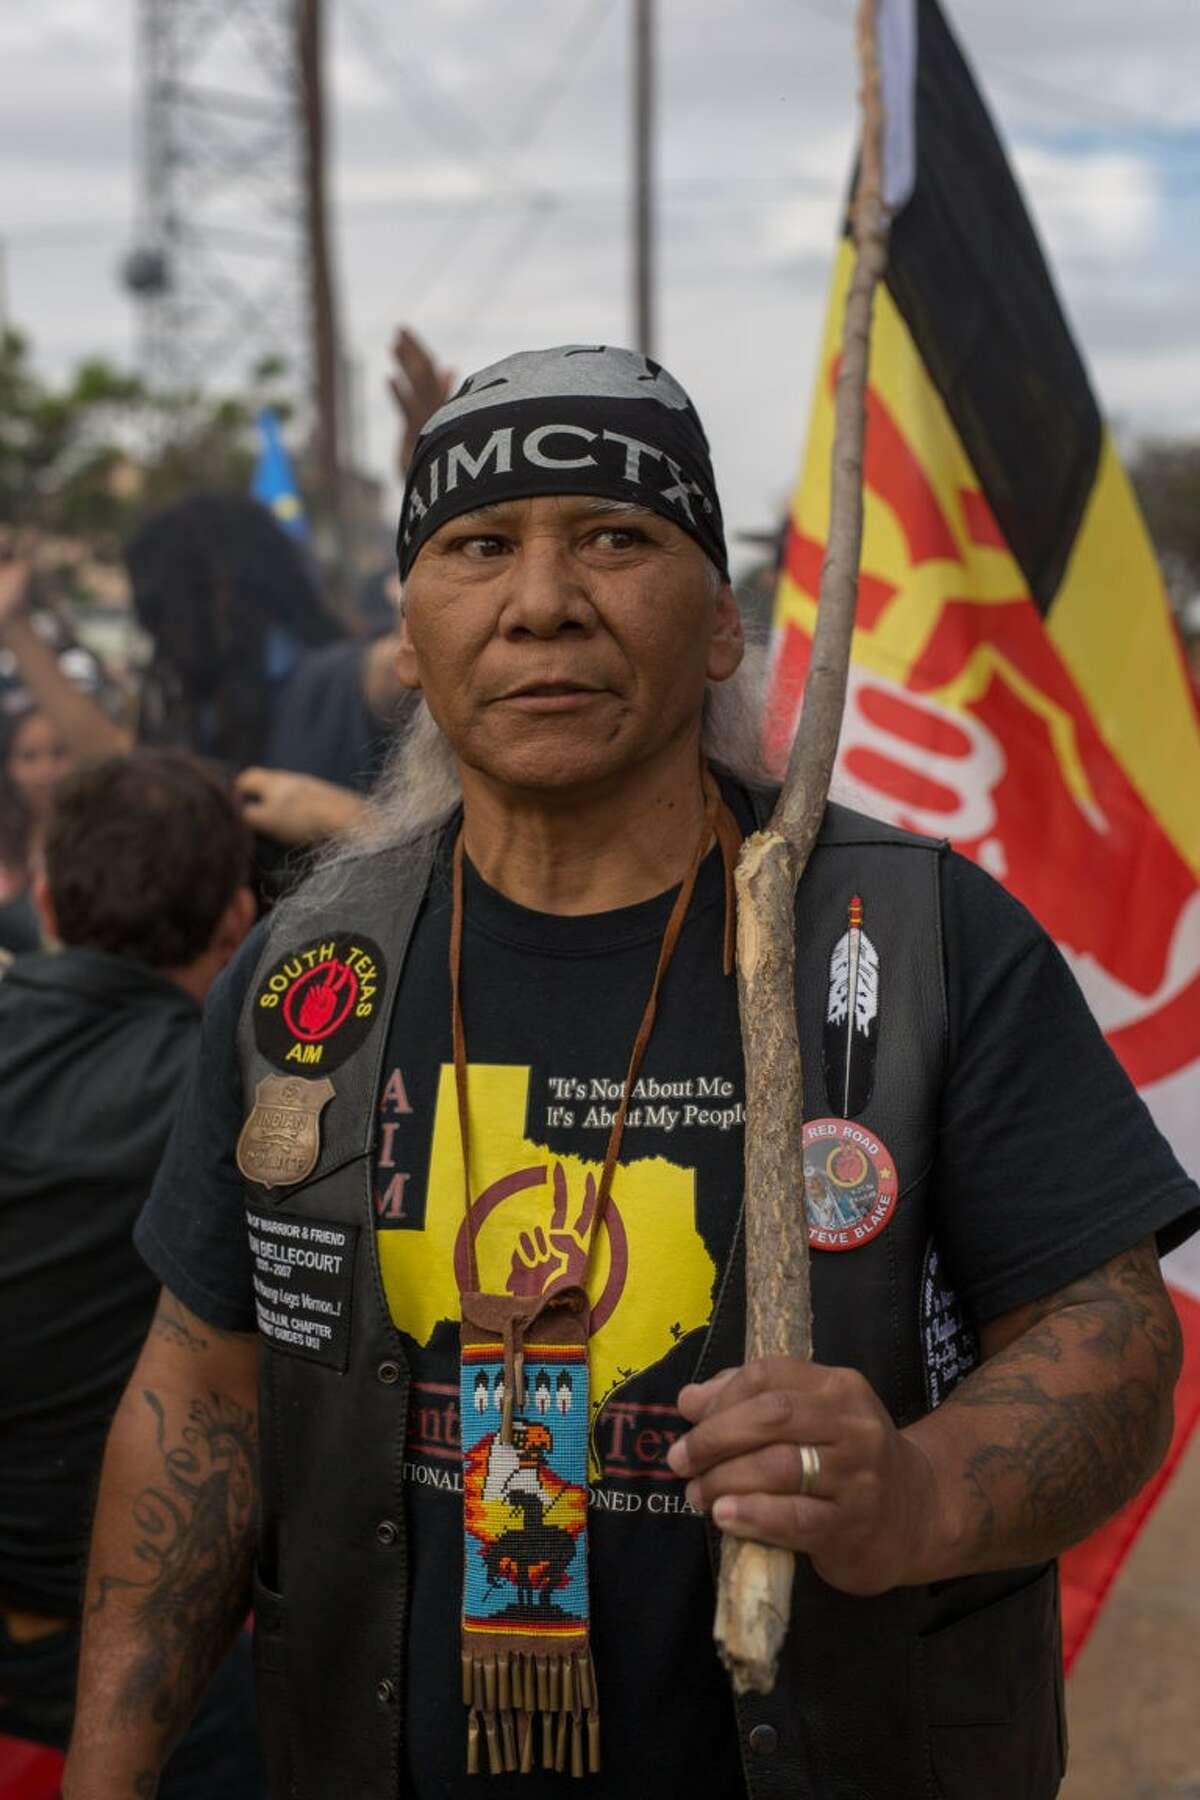 Anti-pipeline activist Pedro Rabago Gutierrez, AKA Pete Hefflin, at a march